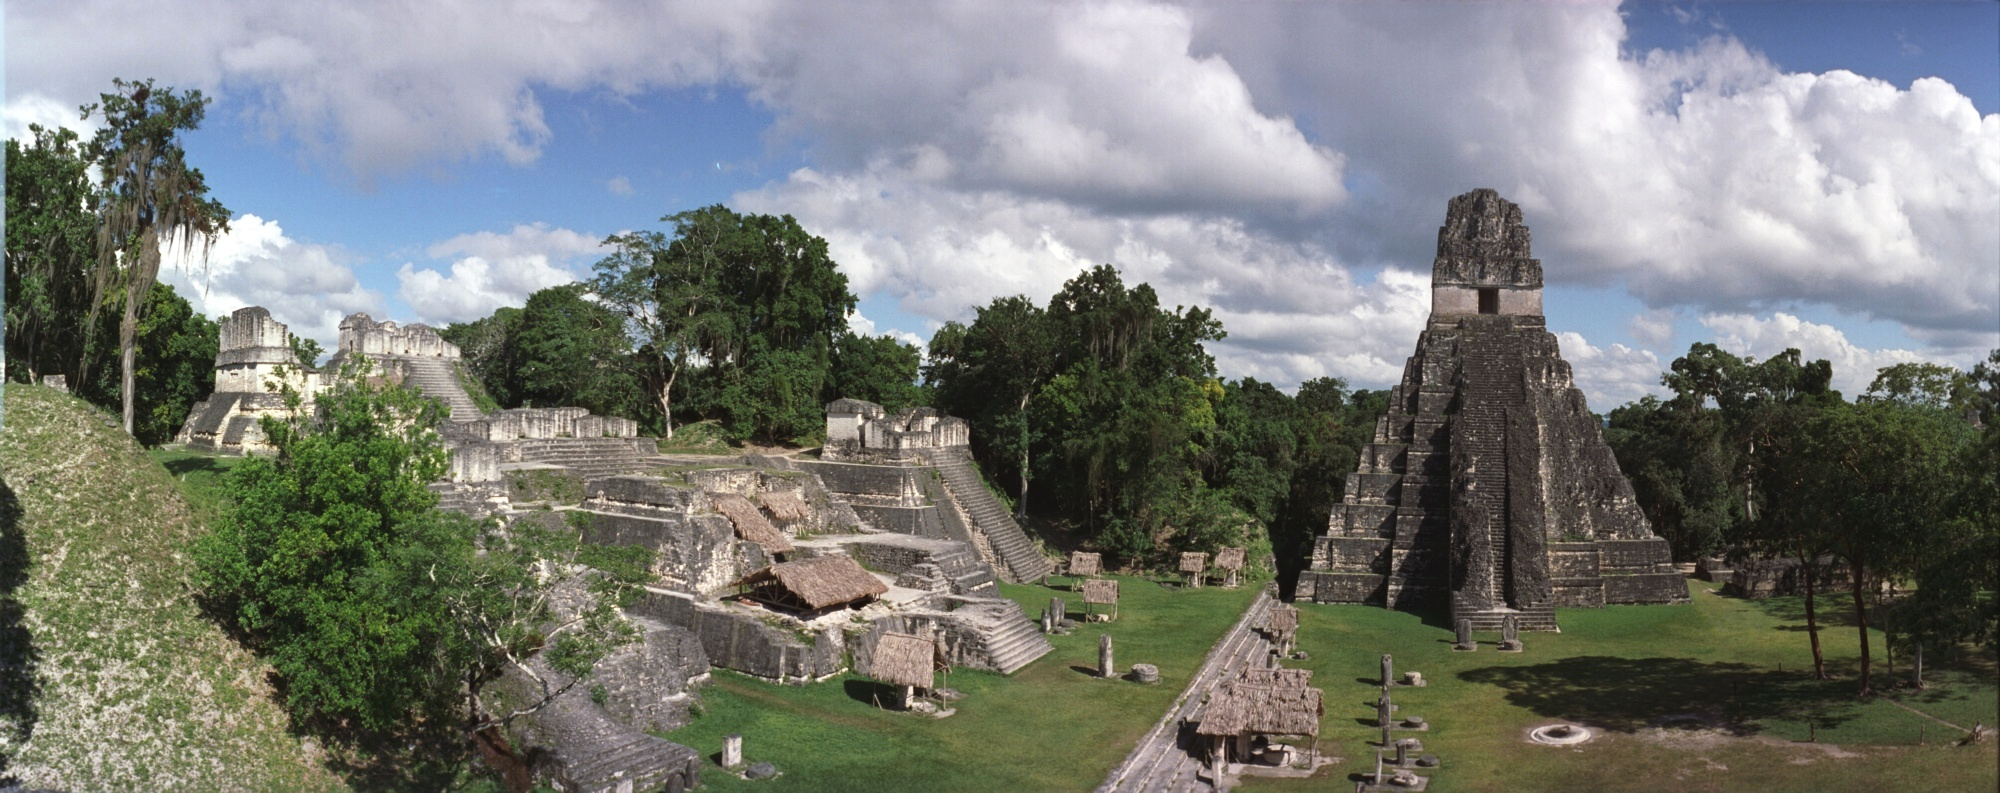 Tikal – pyramida Jaguar – Guate